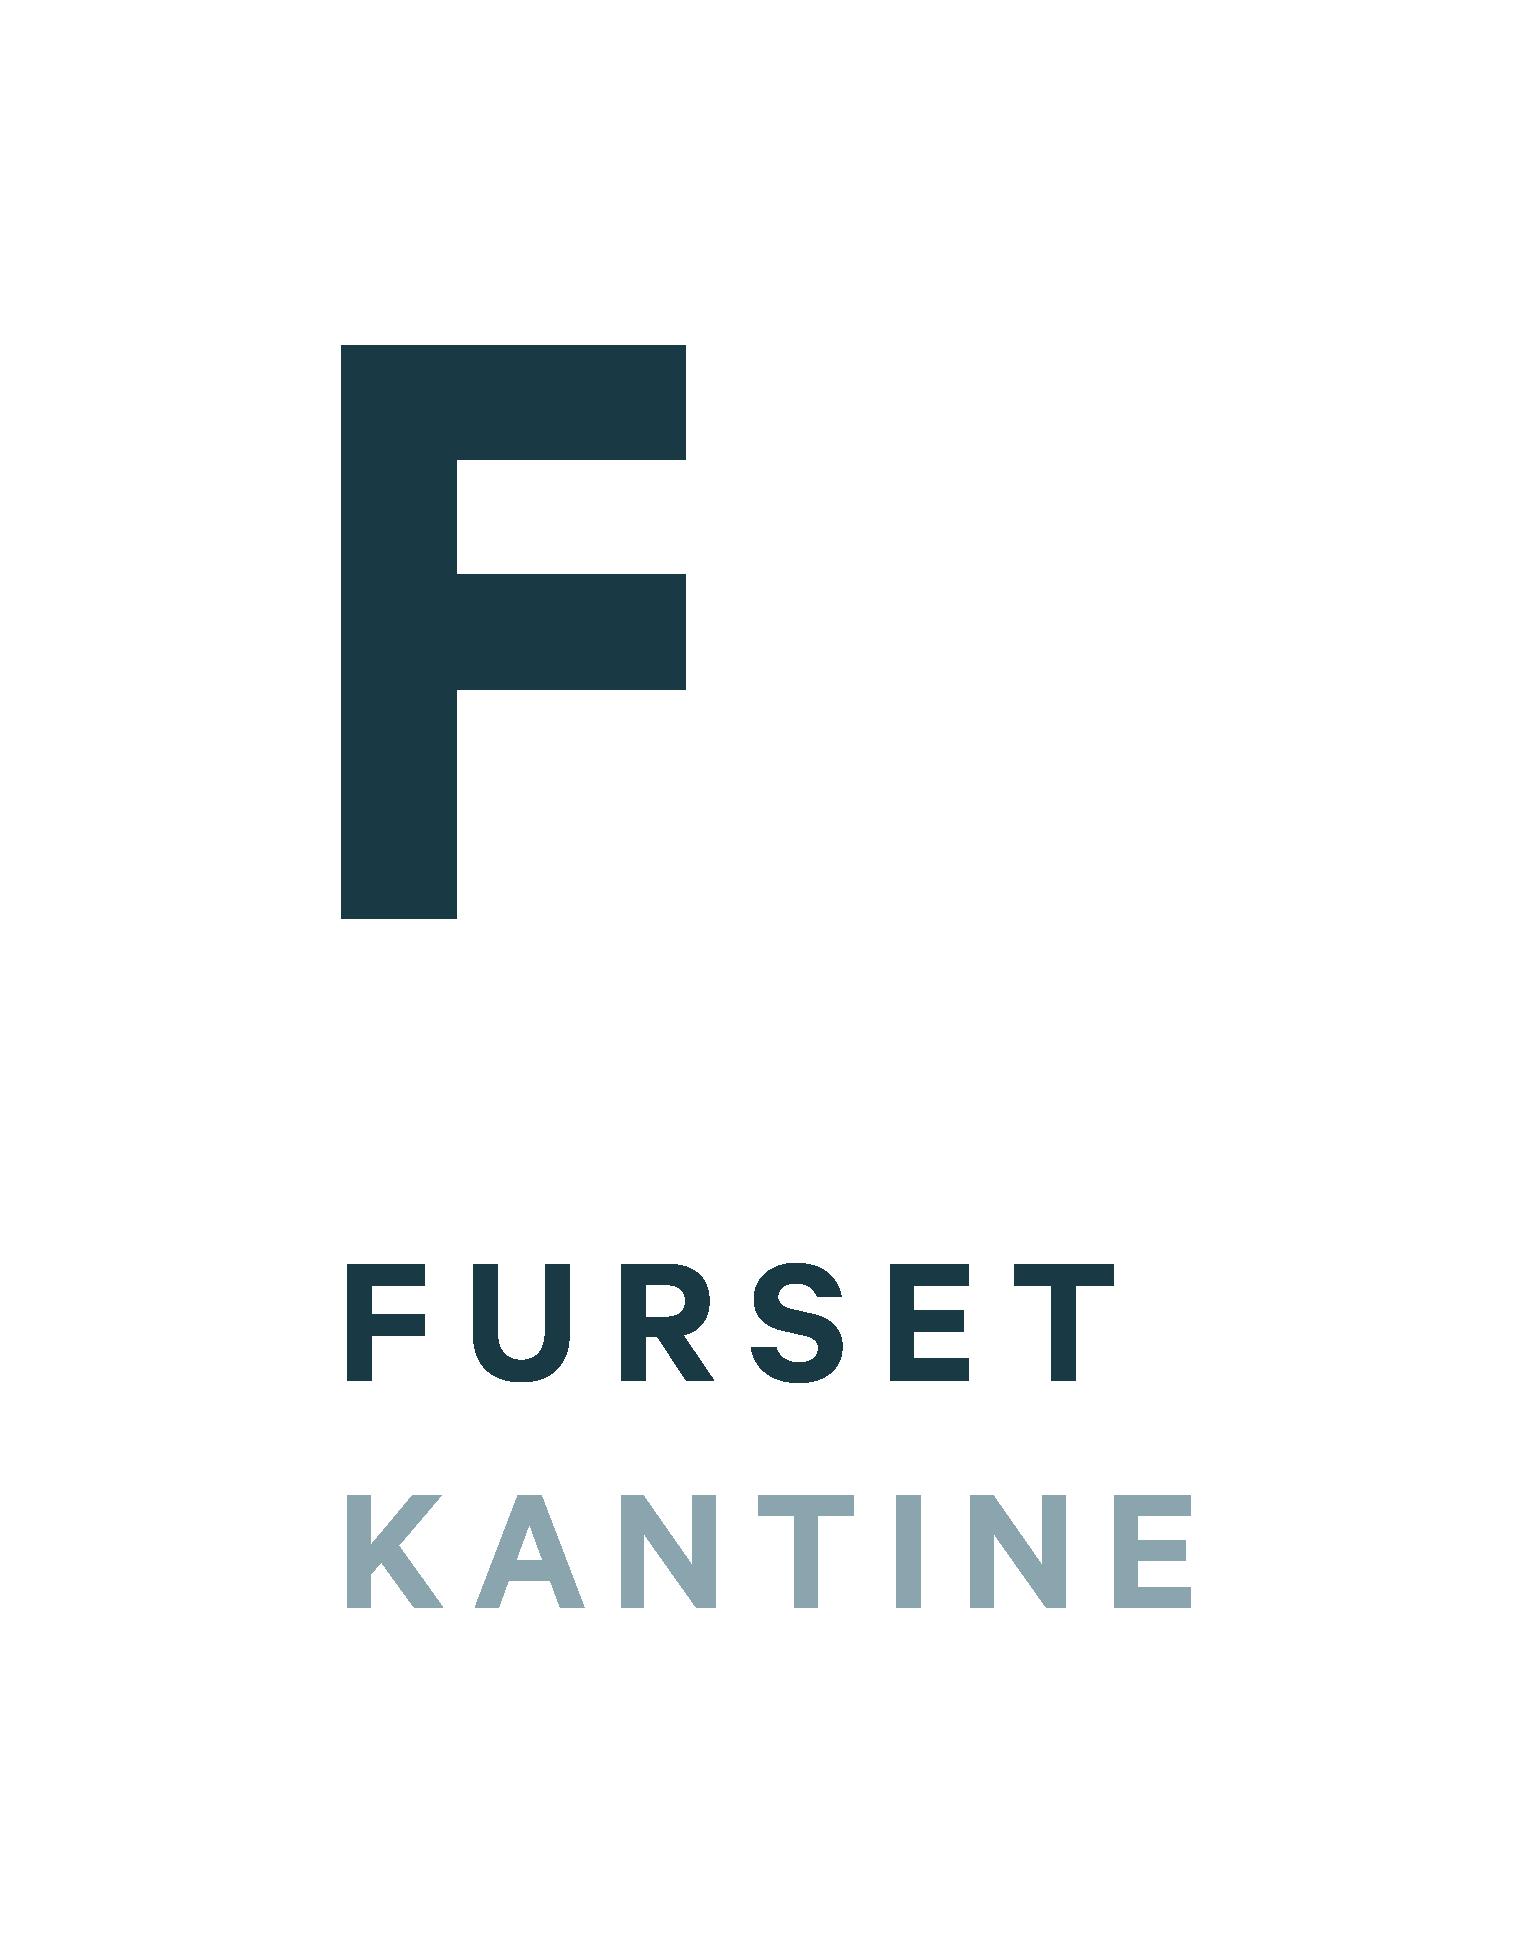 fg_kantine_symbol_vertikal_rgb_positiv